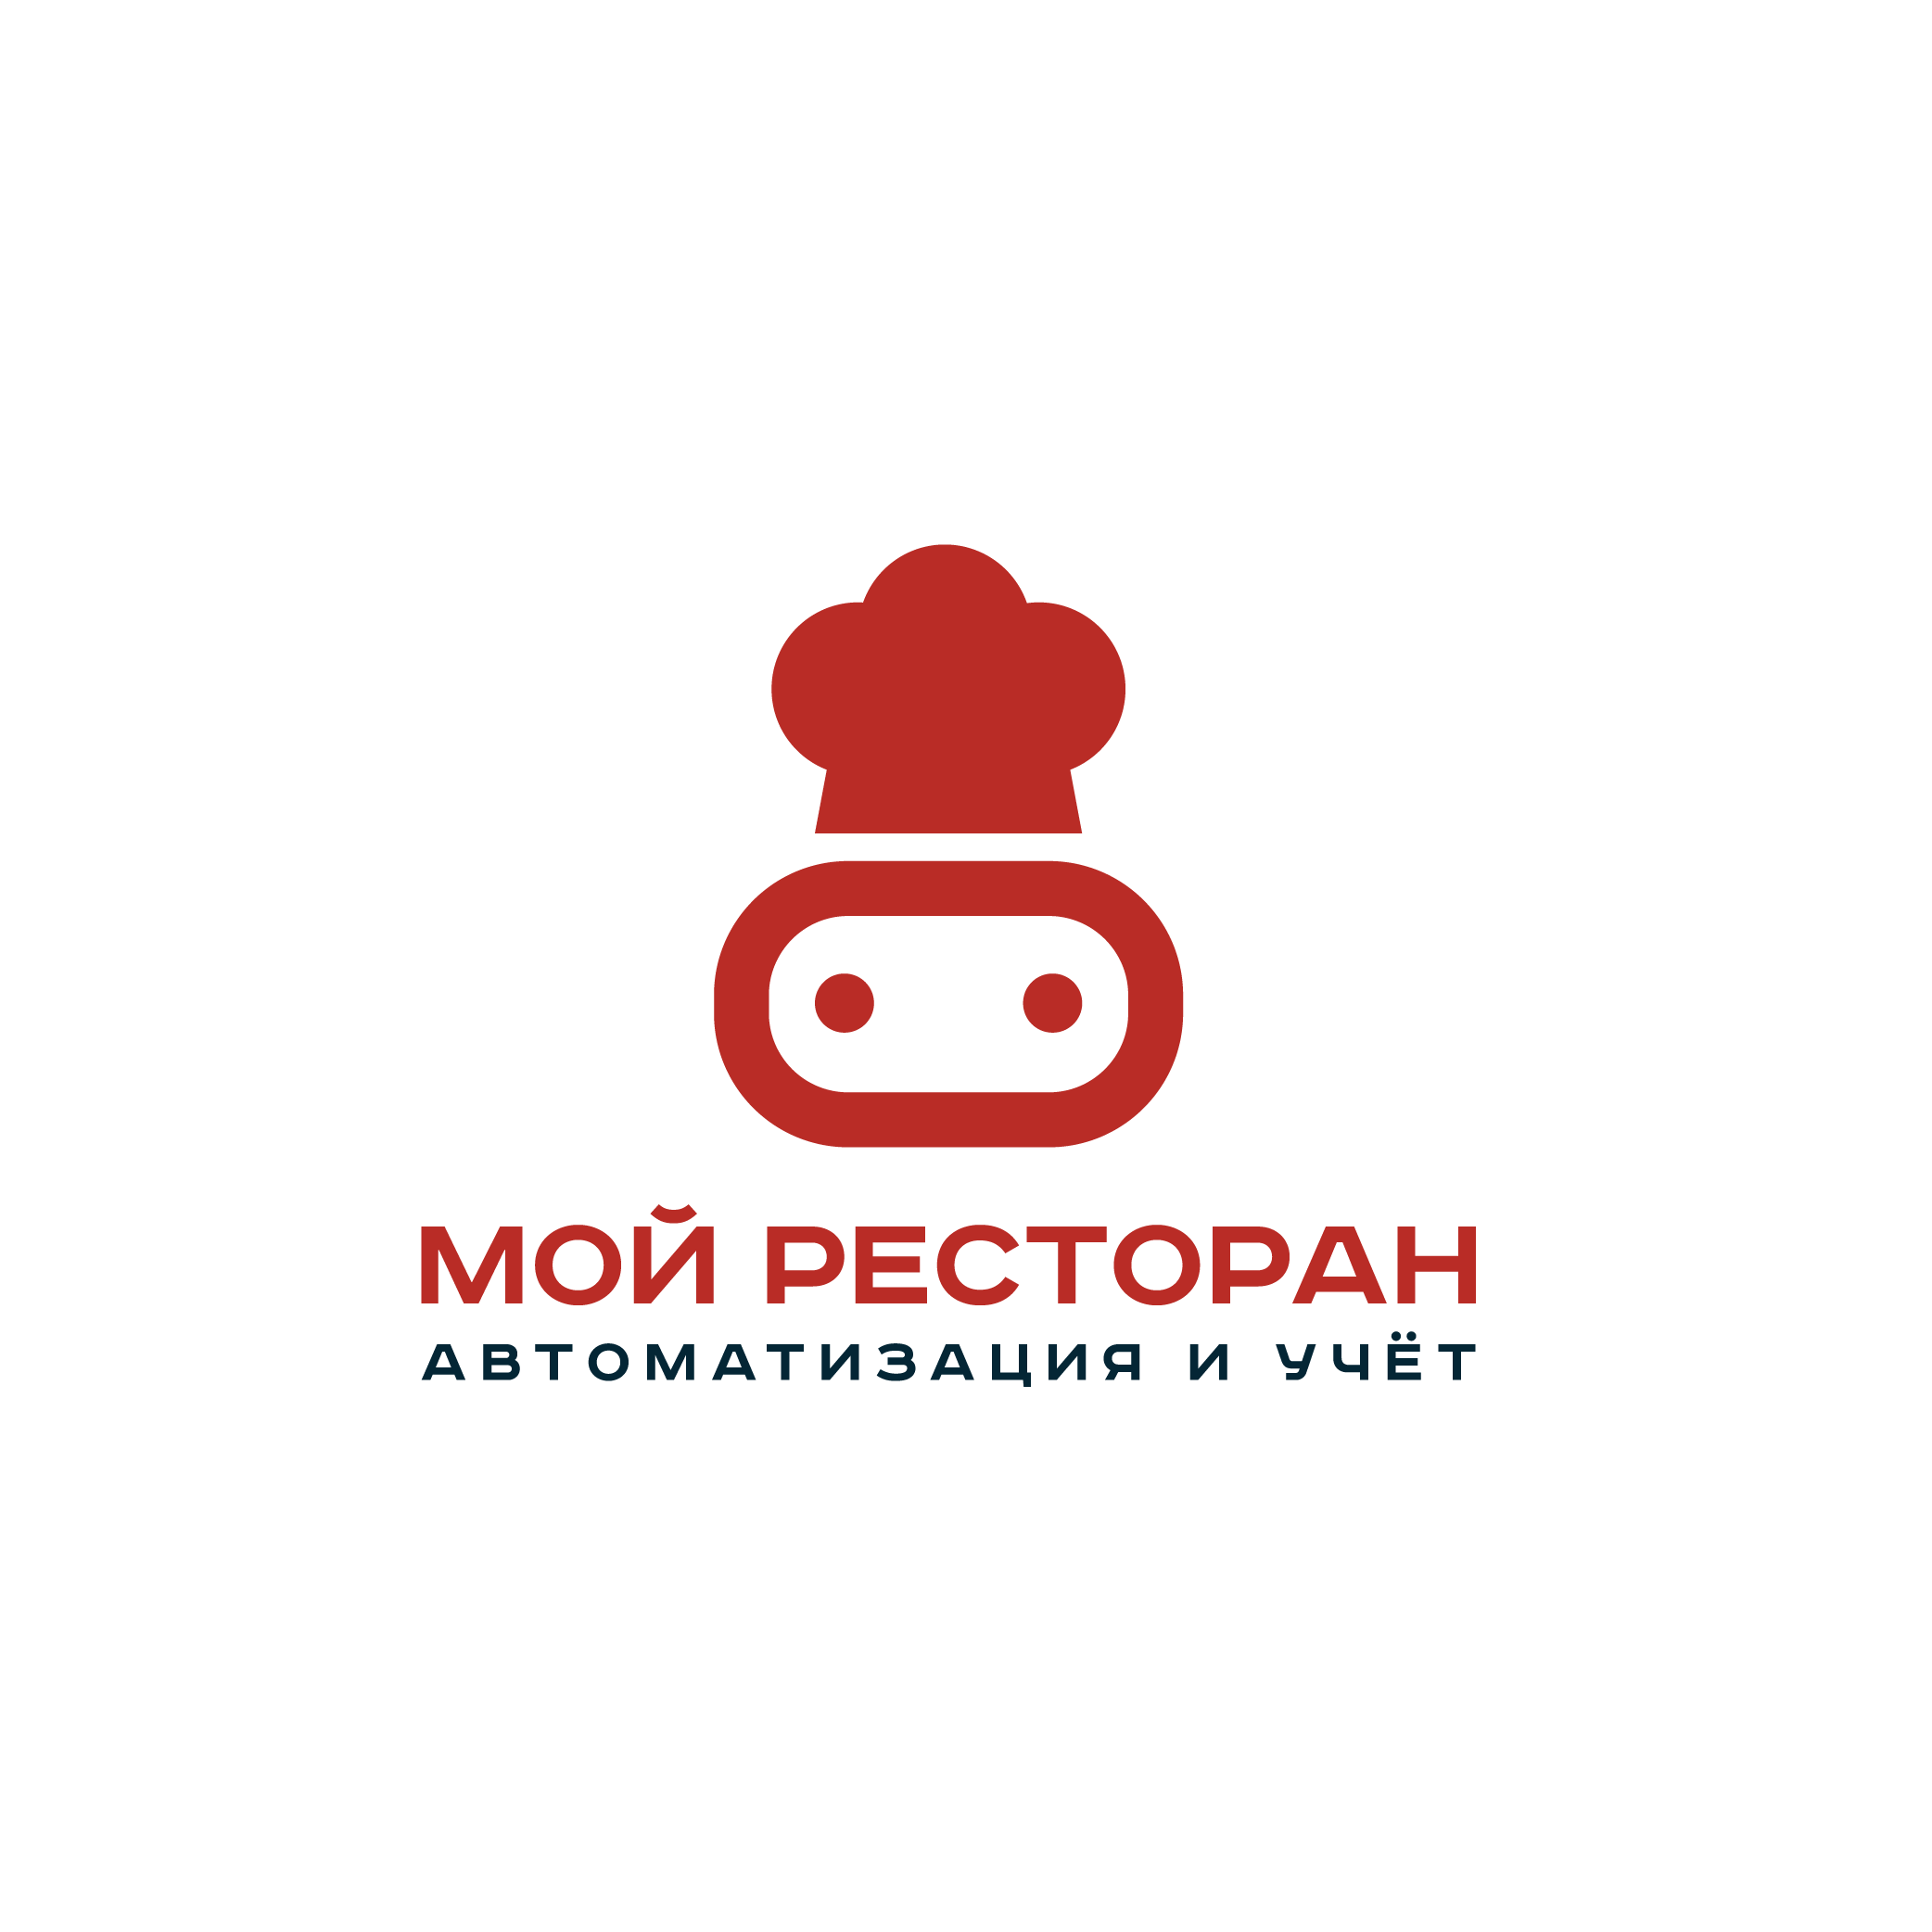 Разработать логотип и фавикон для IT- компании фото f_0805d5459c068c1a.png